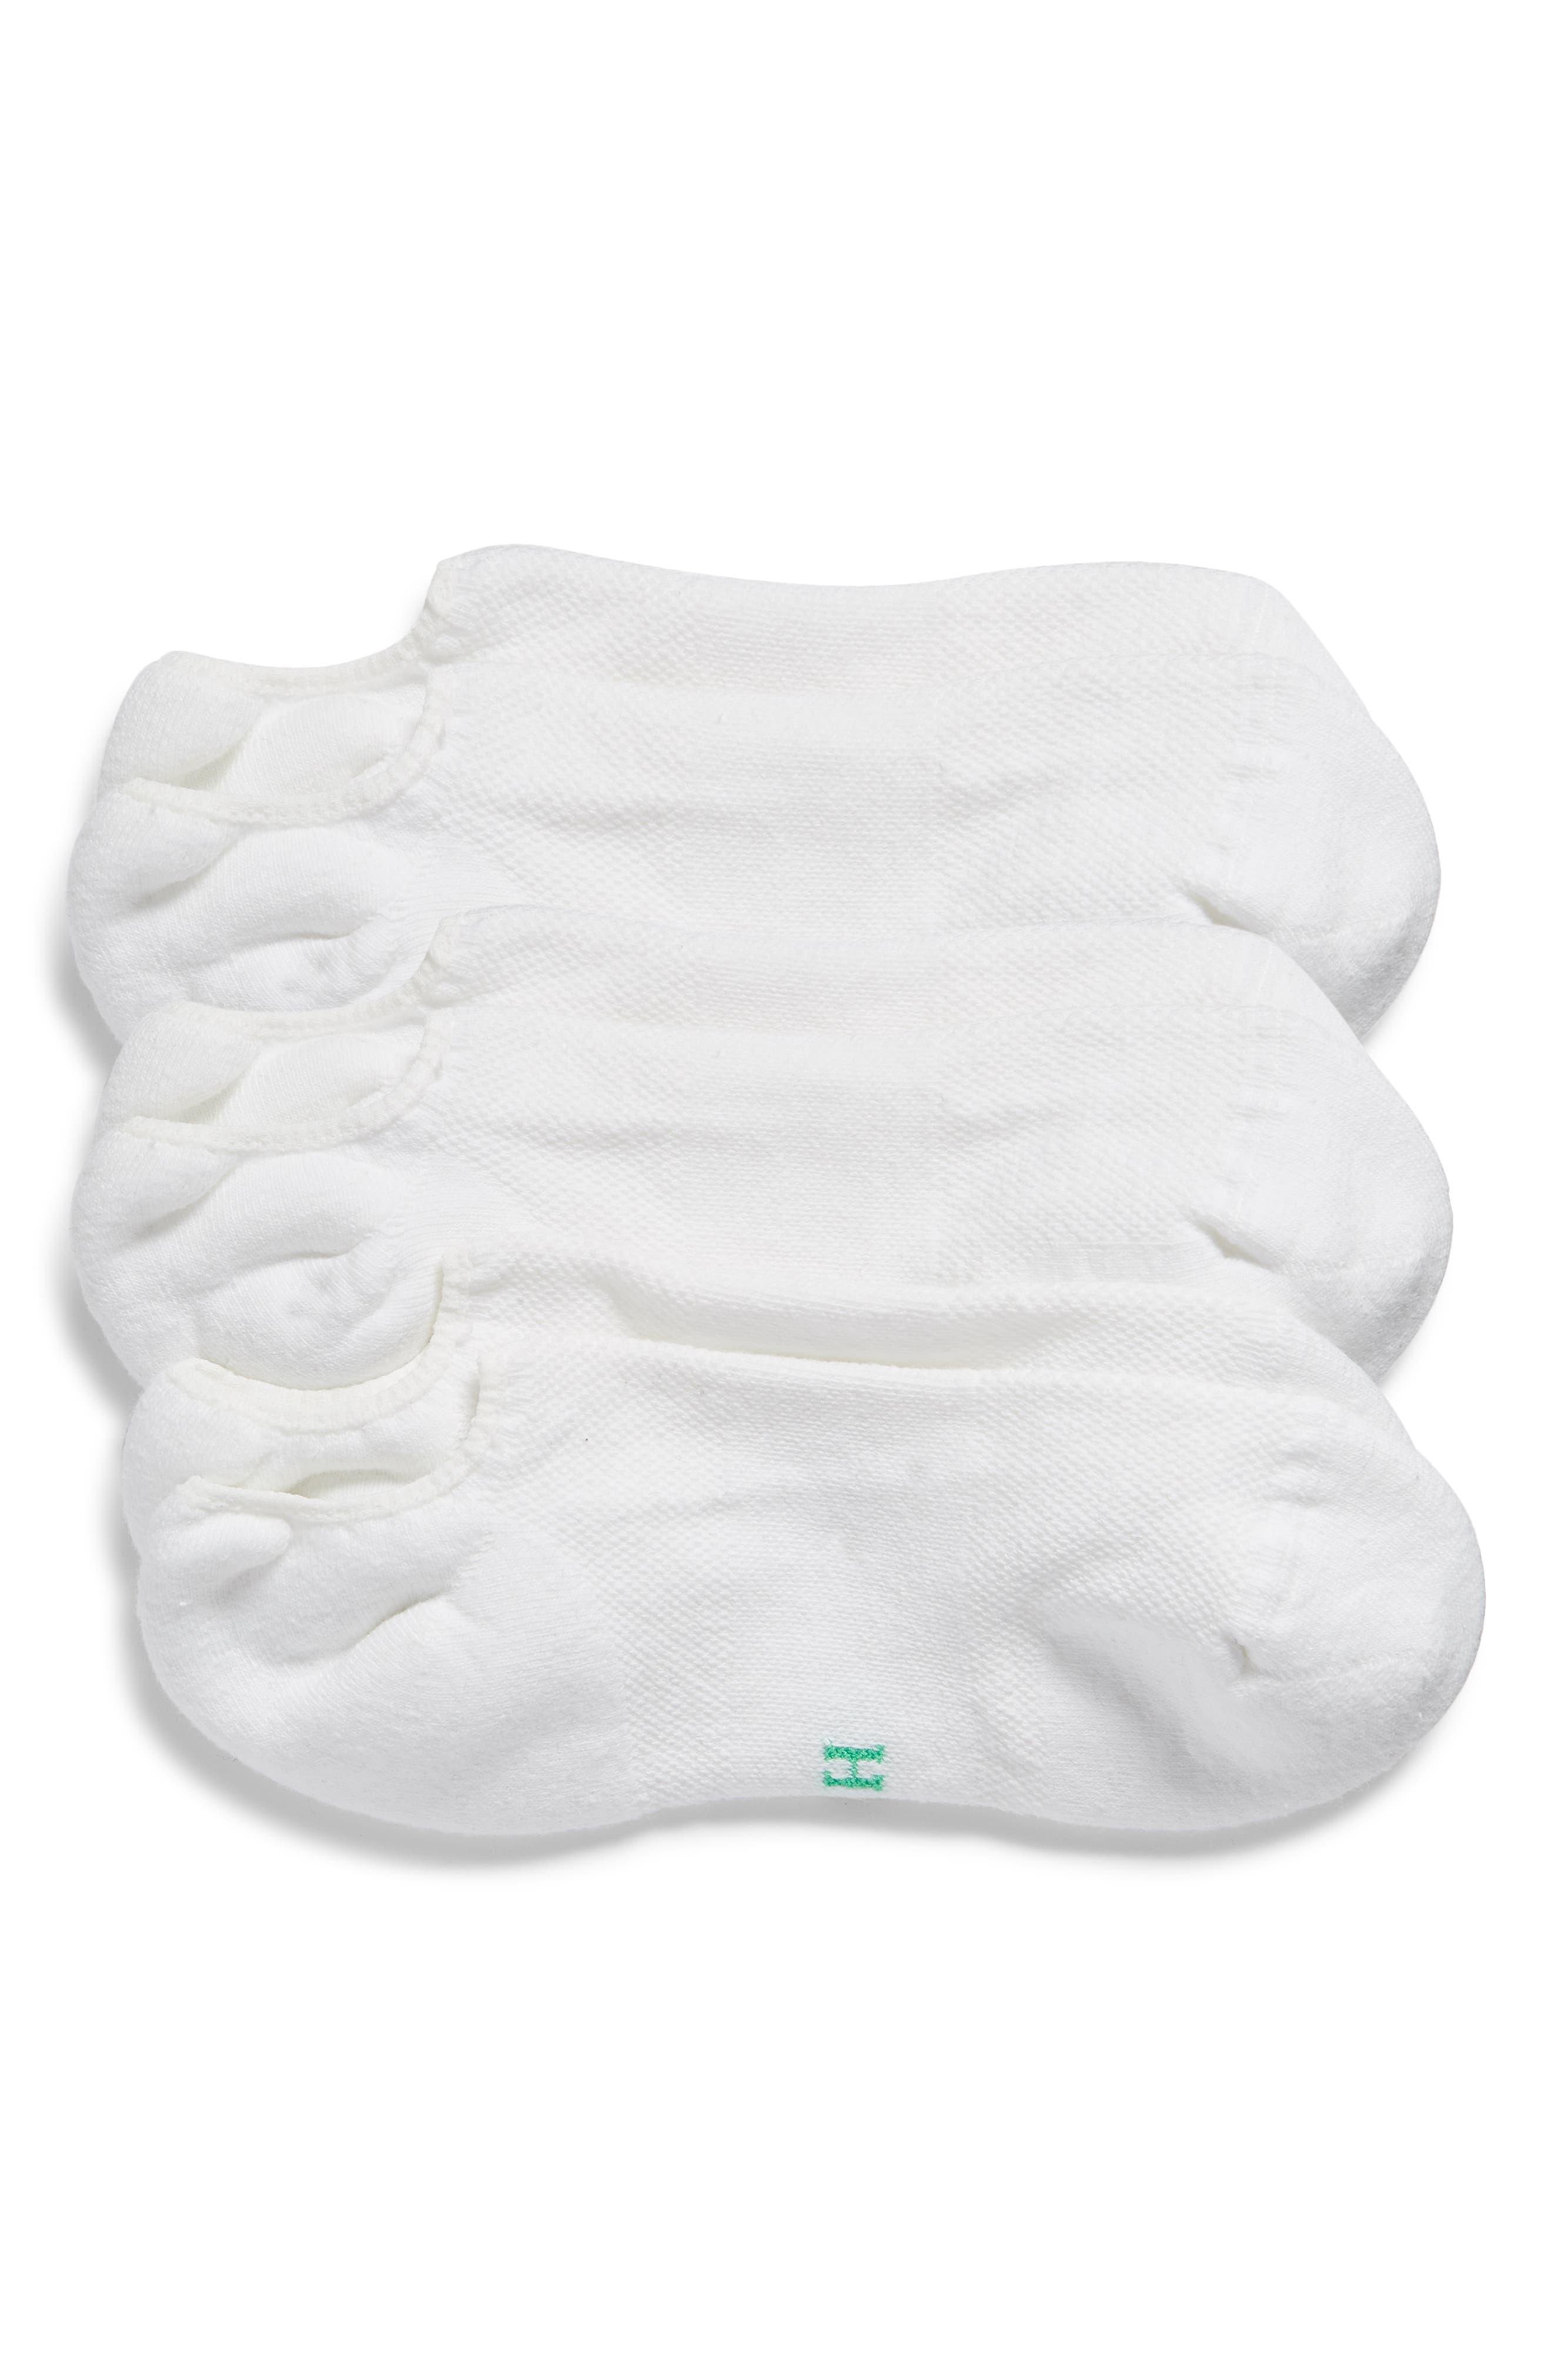 Hue Ecosport 3-Pack Cushion No-Show Socks   Nordstrom